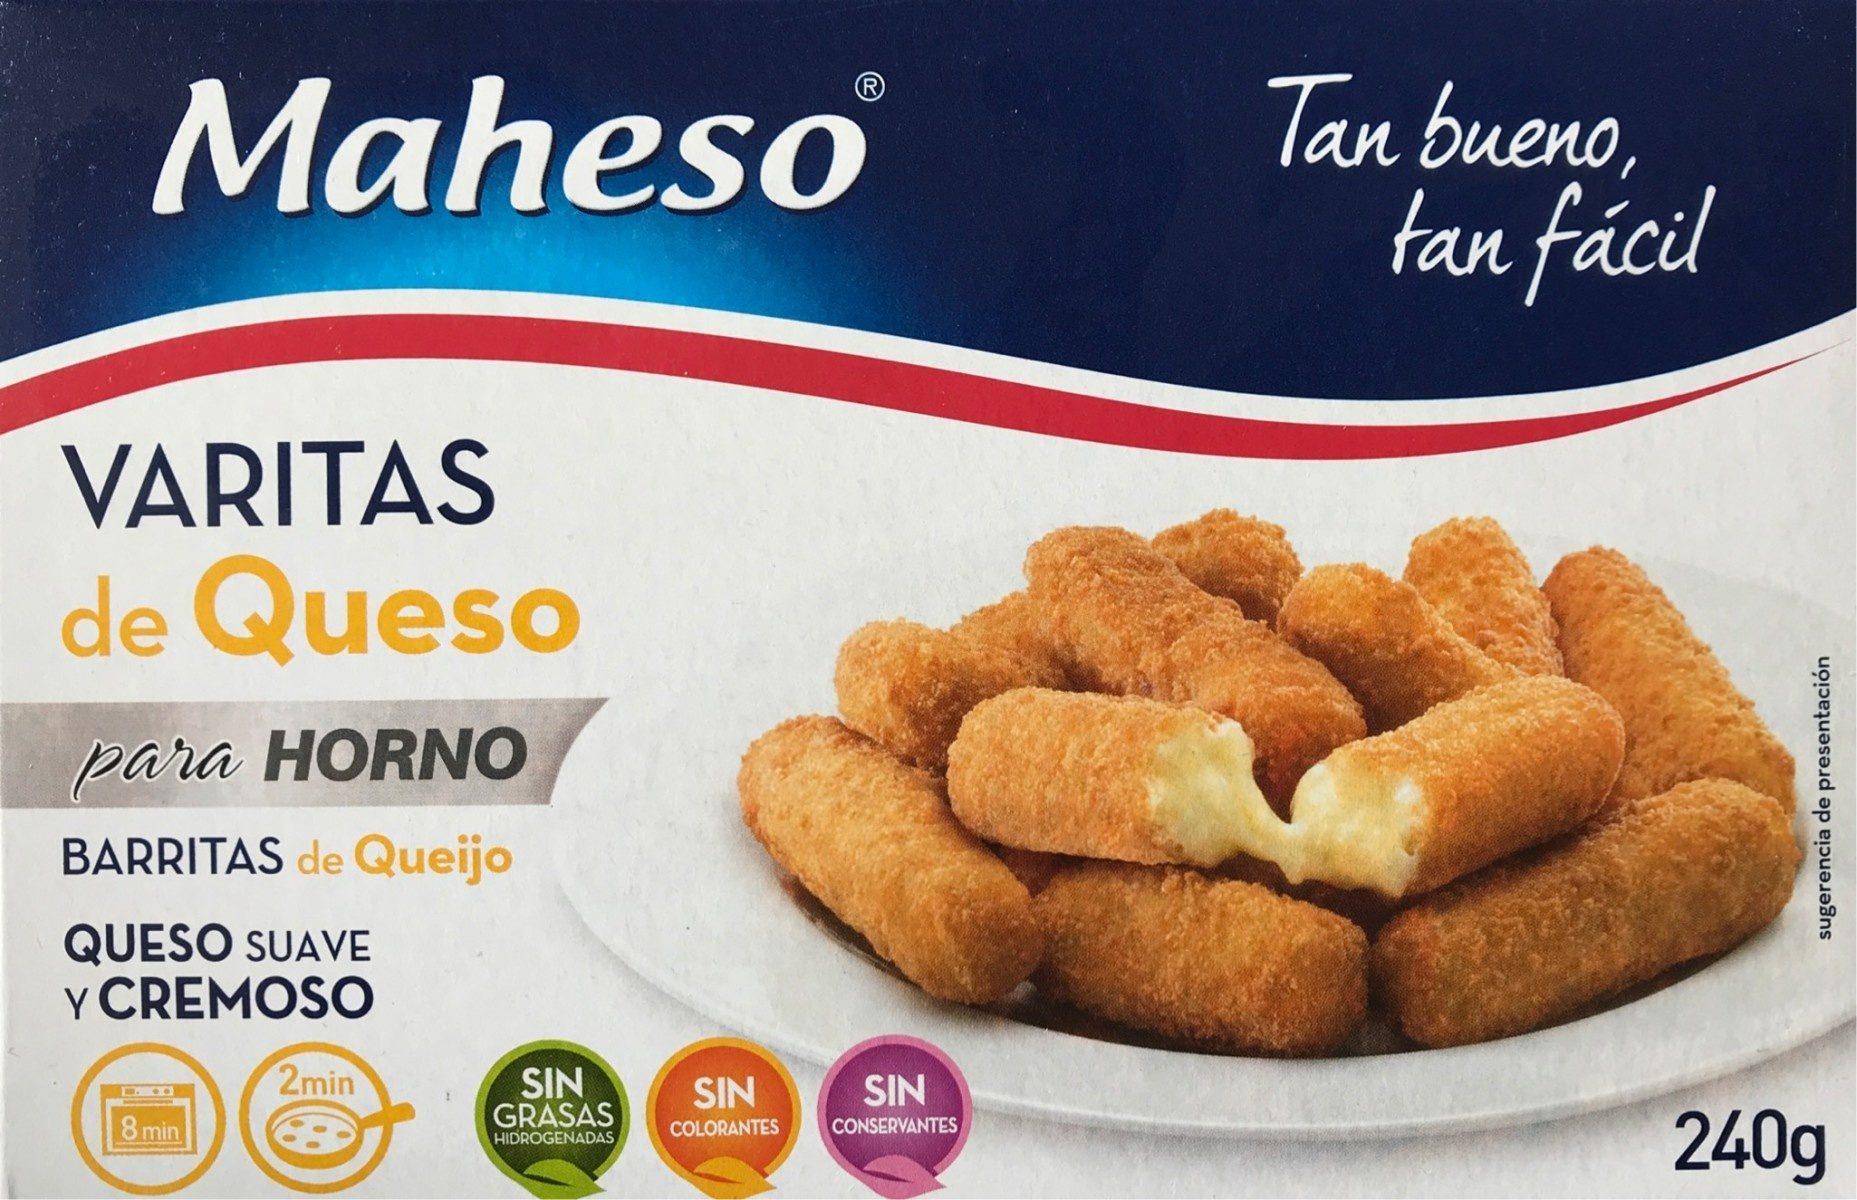 Maheso Varitas de Queso - Produit - fr